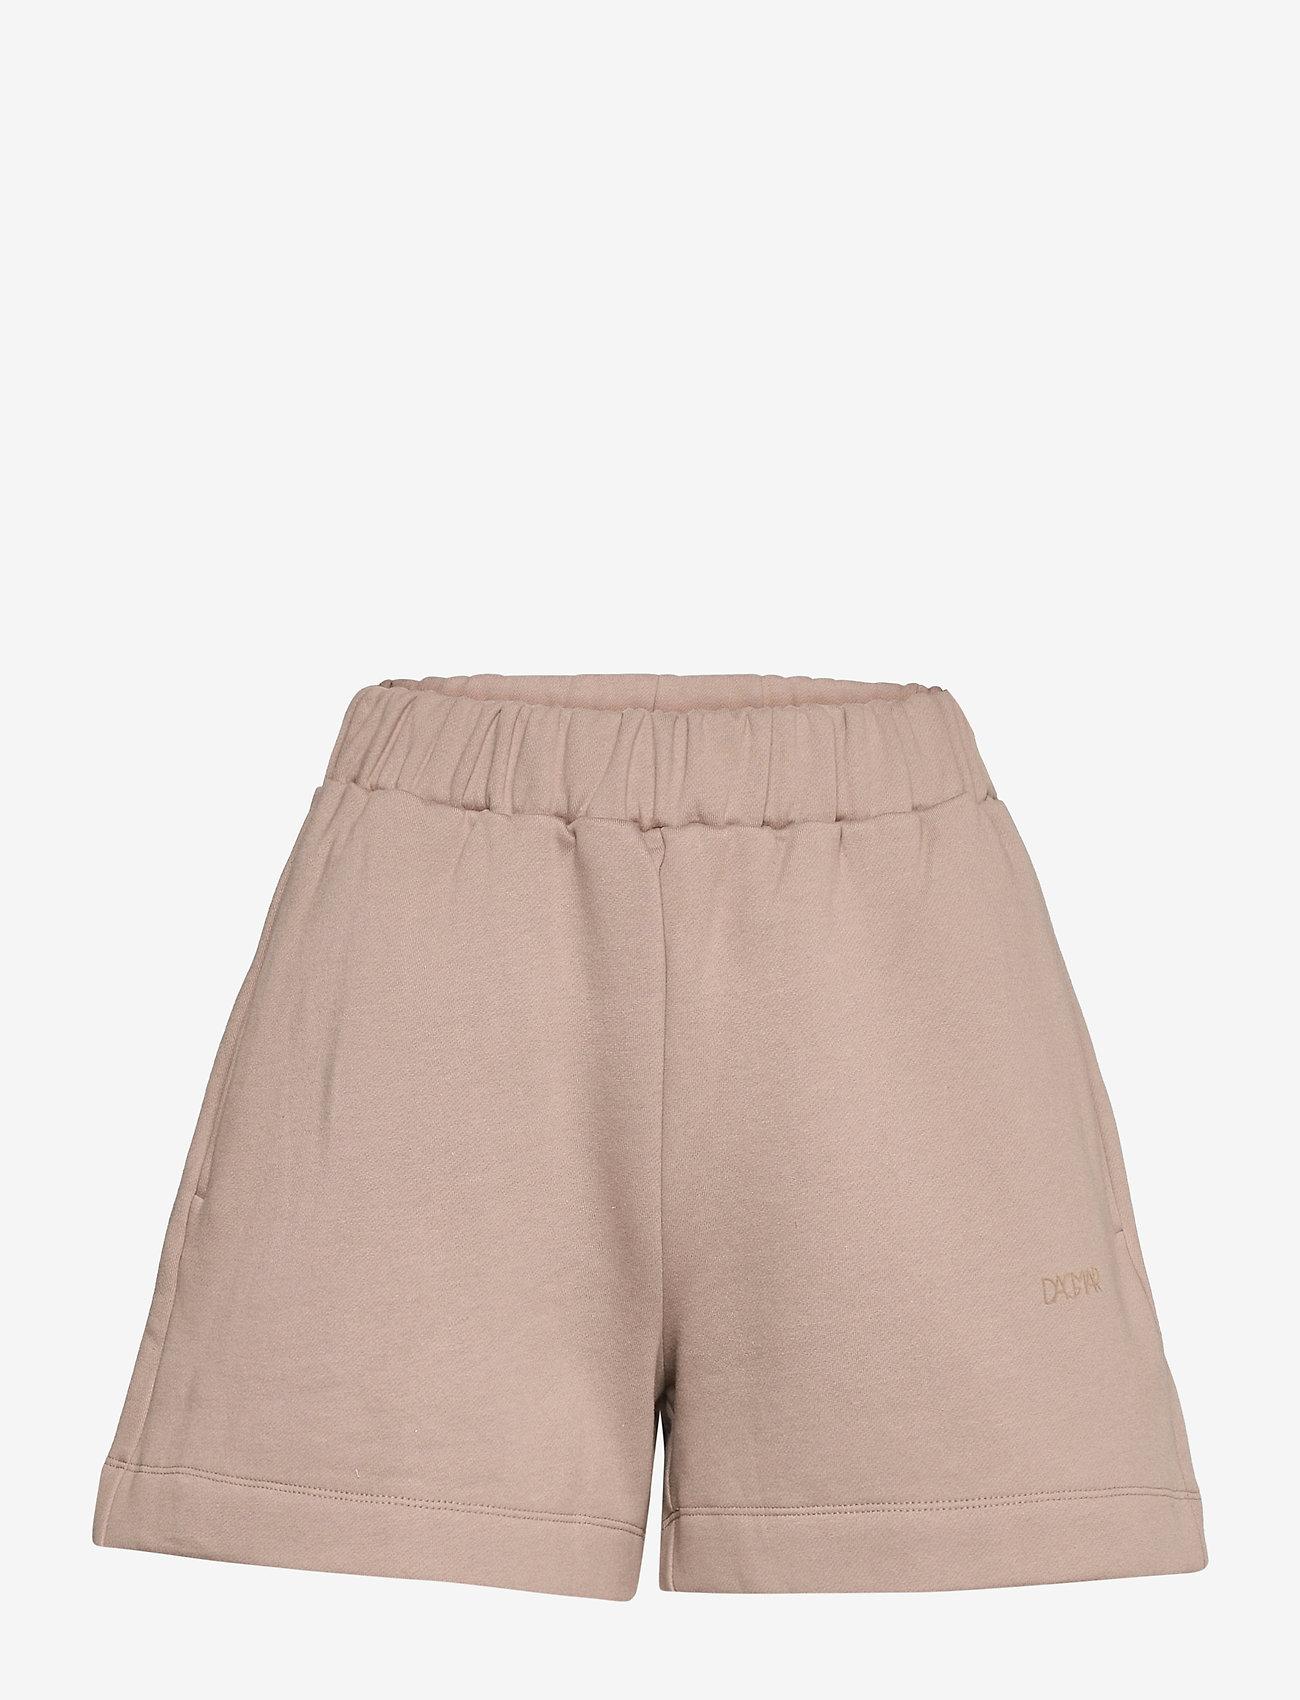 Dagmar - Jam shorts - shorts casual - nocciola - 0